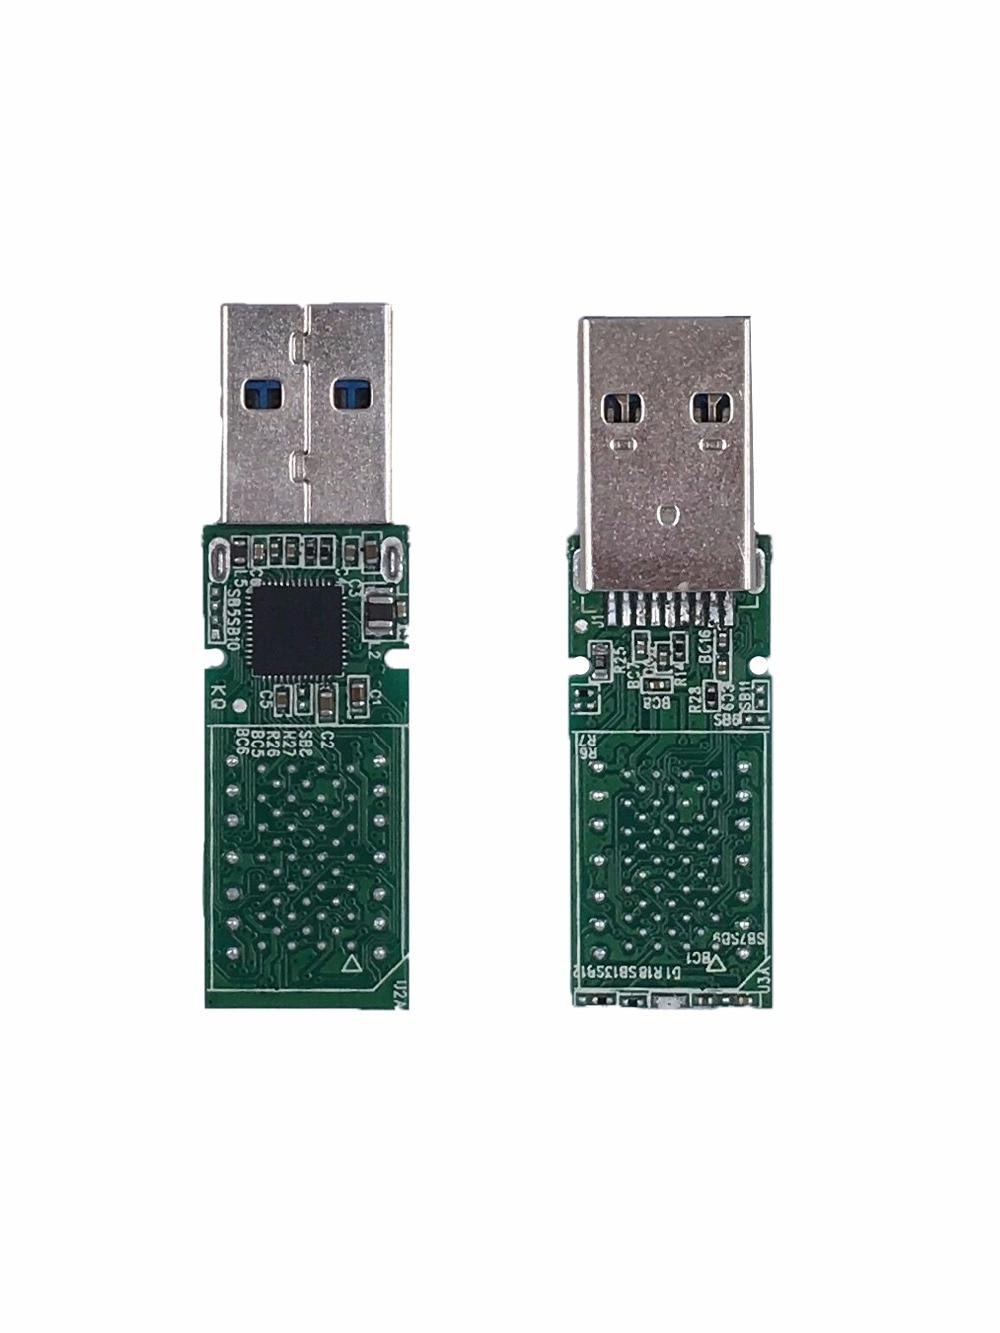 Apple LGA60 SM3267L usb 3.0 USB FLASH DRIVE disk board free crystal with LGA double-pad E2NAND Hynix E NAND FLASH DIY UFD KITS цены онлайн